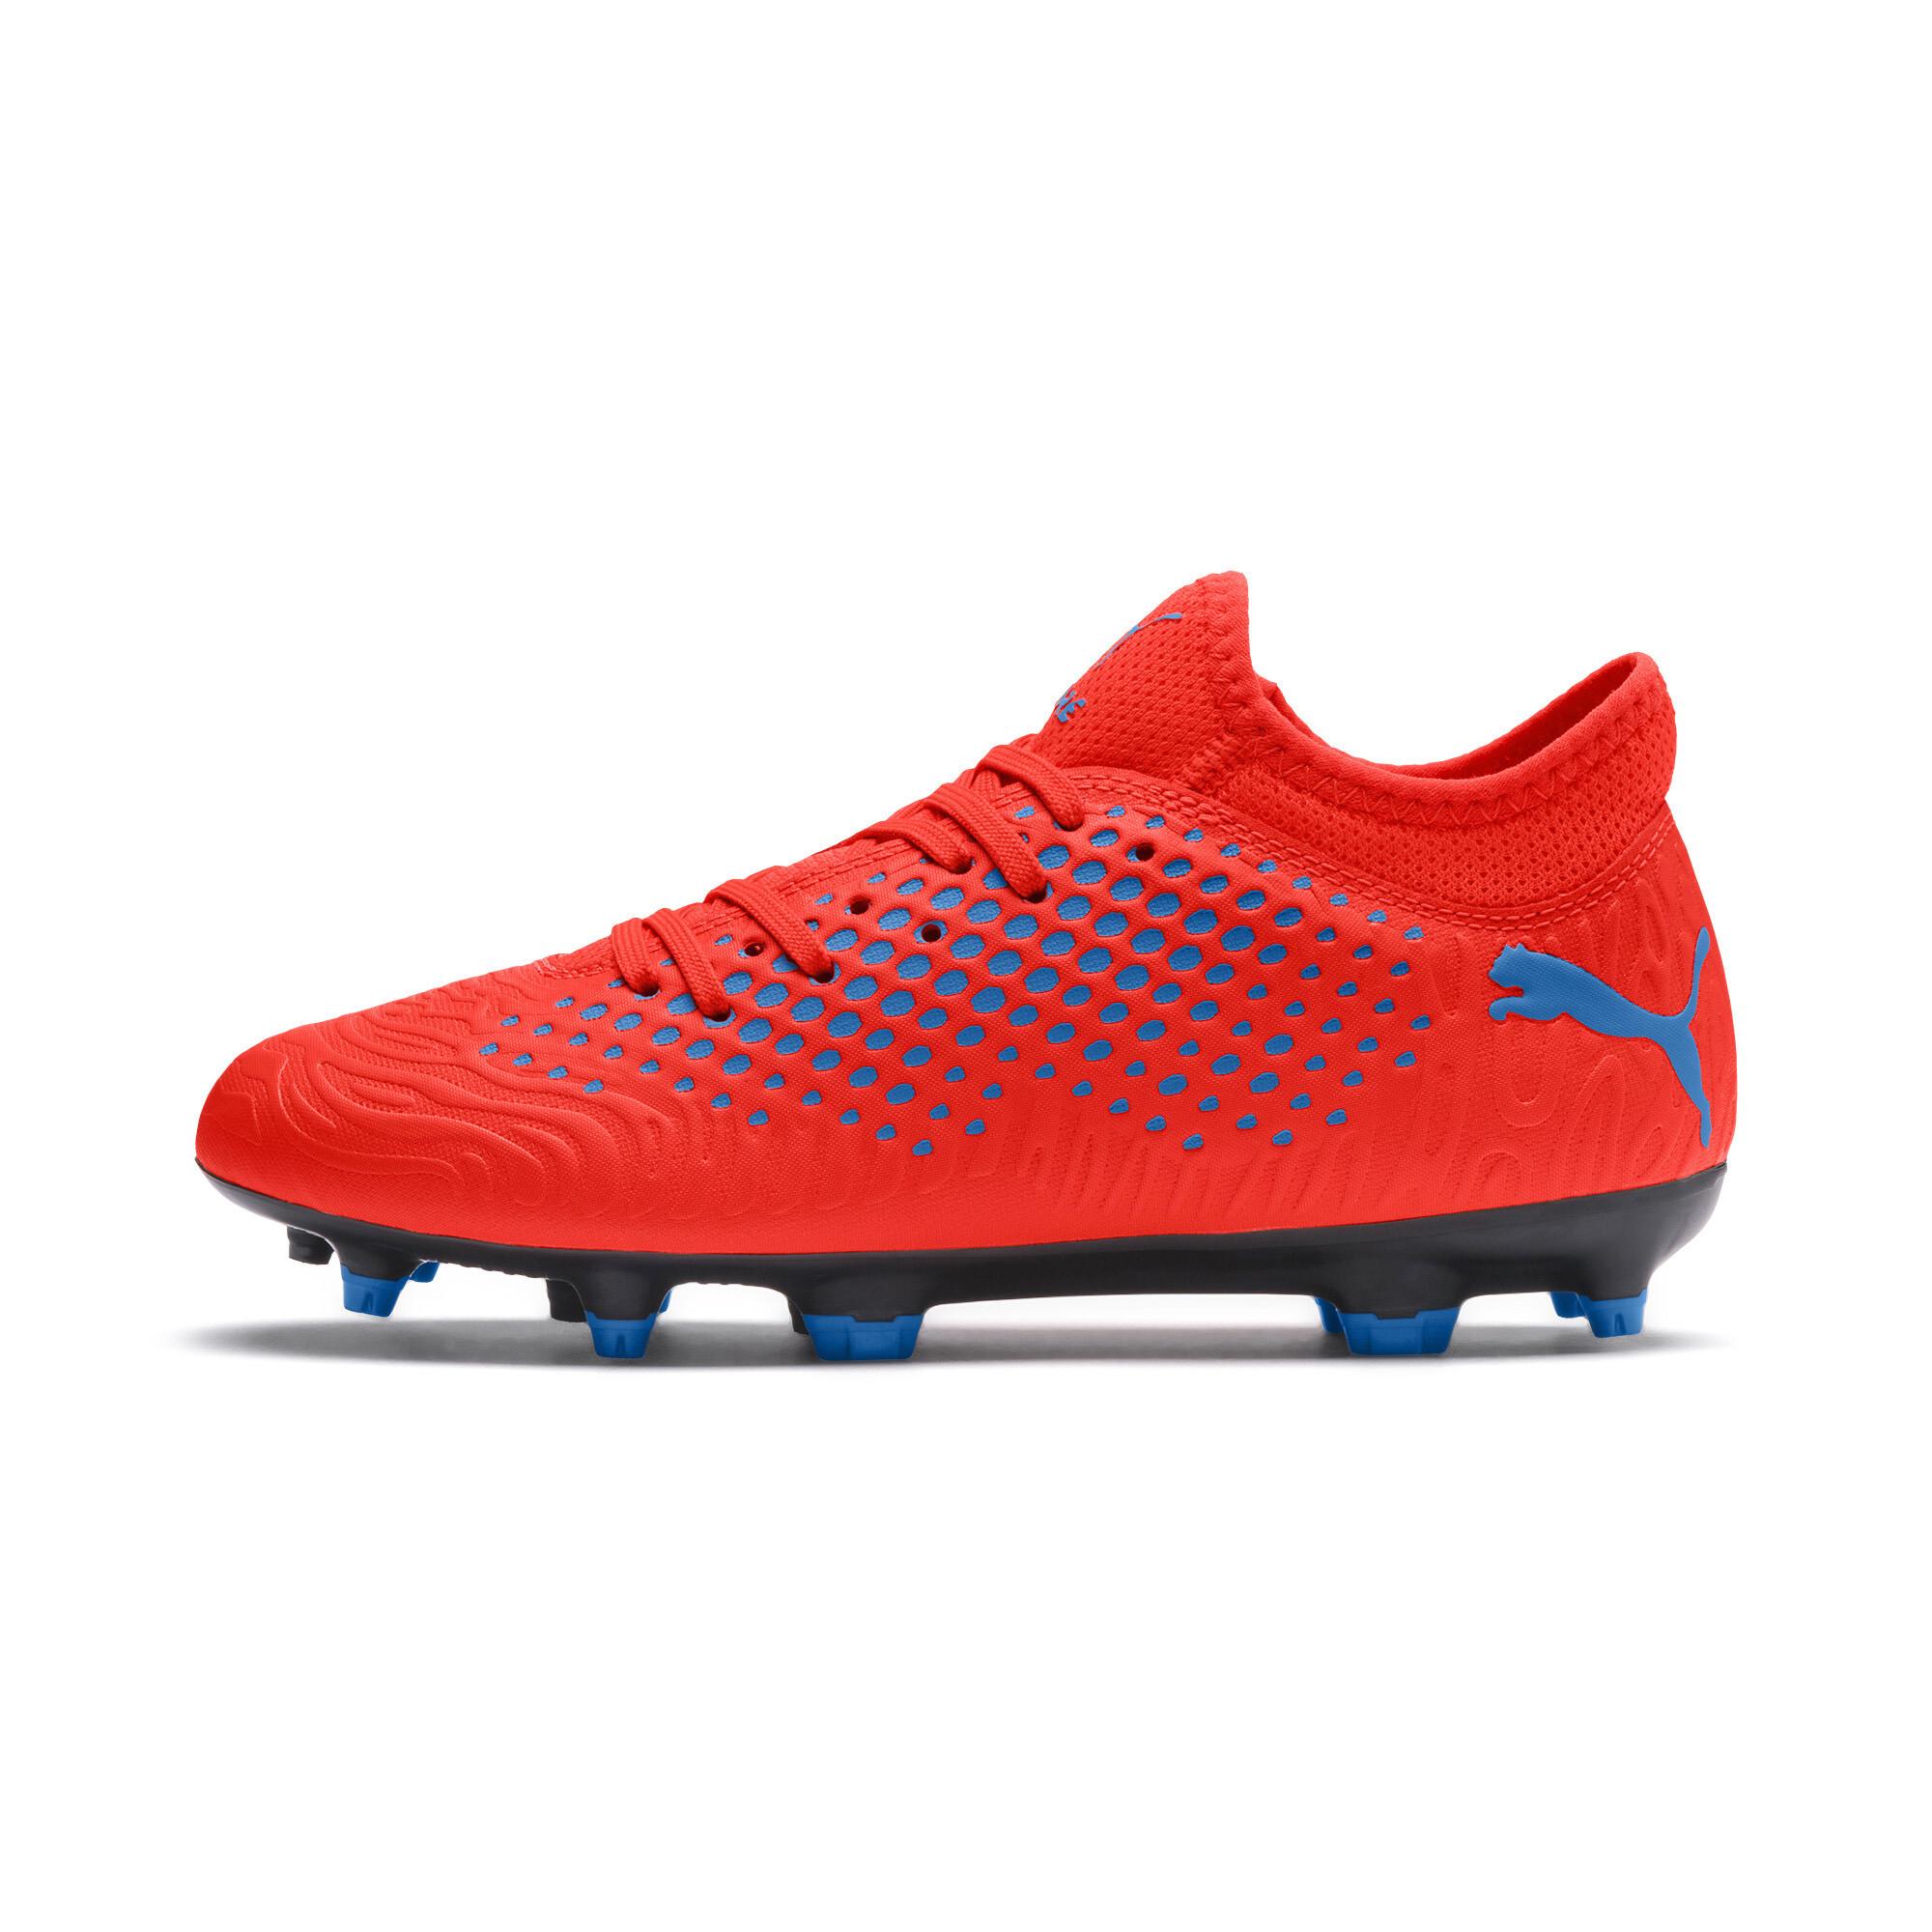 807d62649ac7b Image Puma FUTURE 19.4 FG AG Youth Football Boots  1